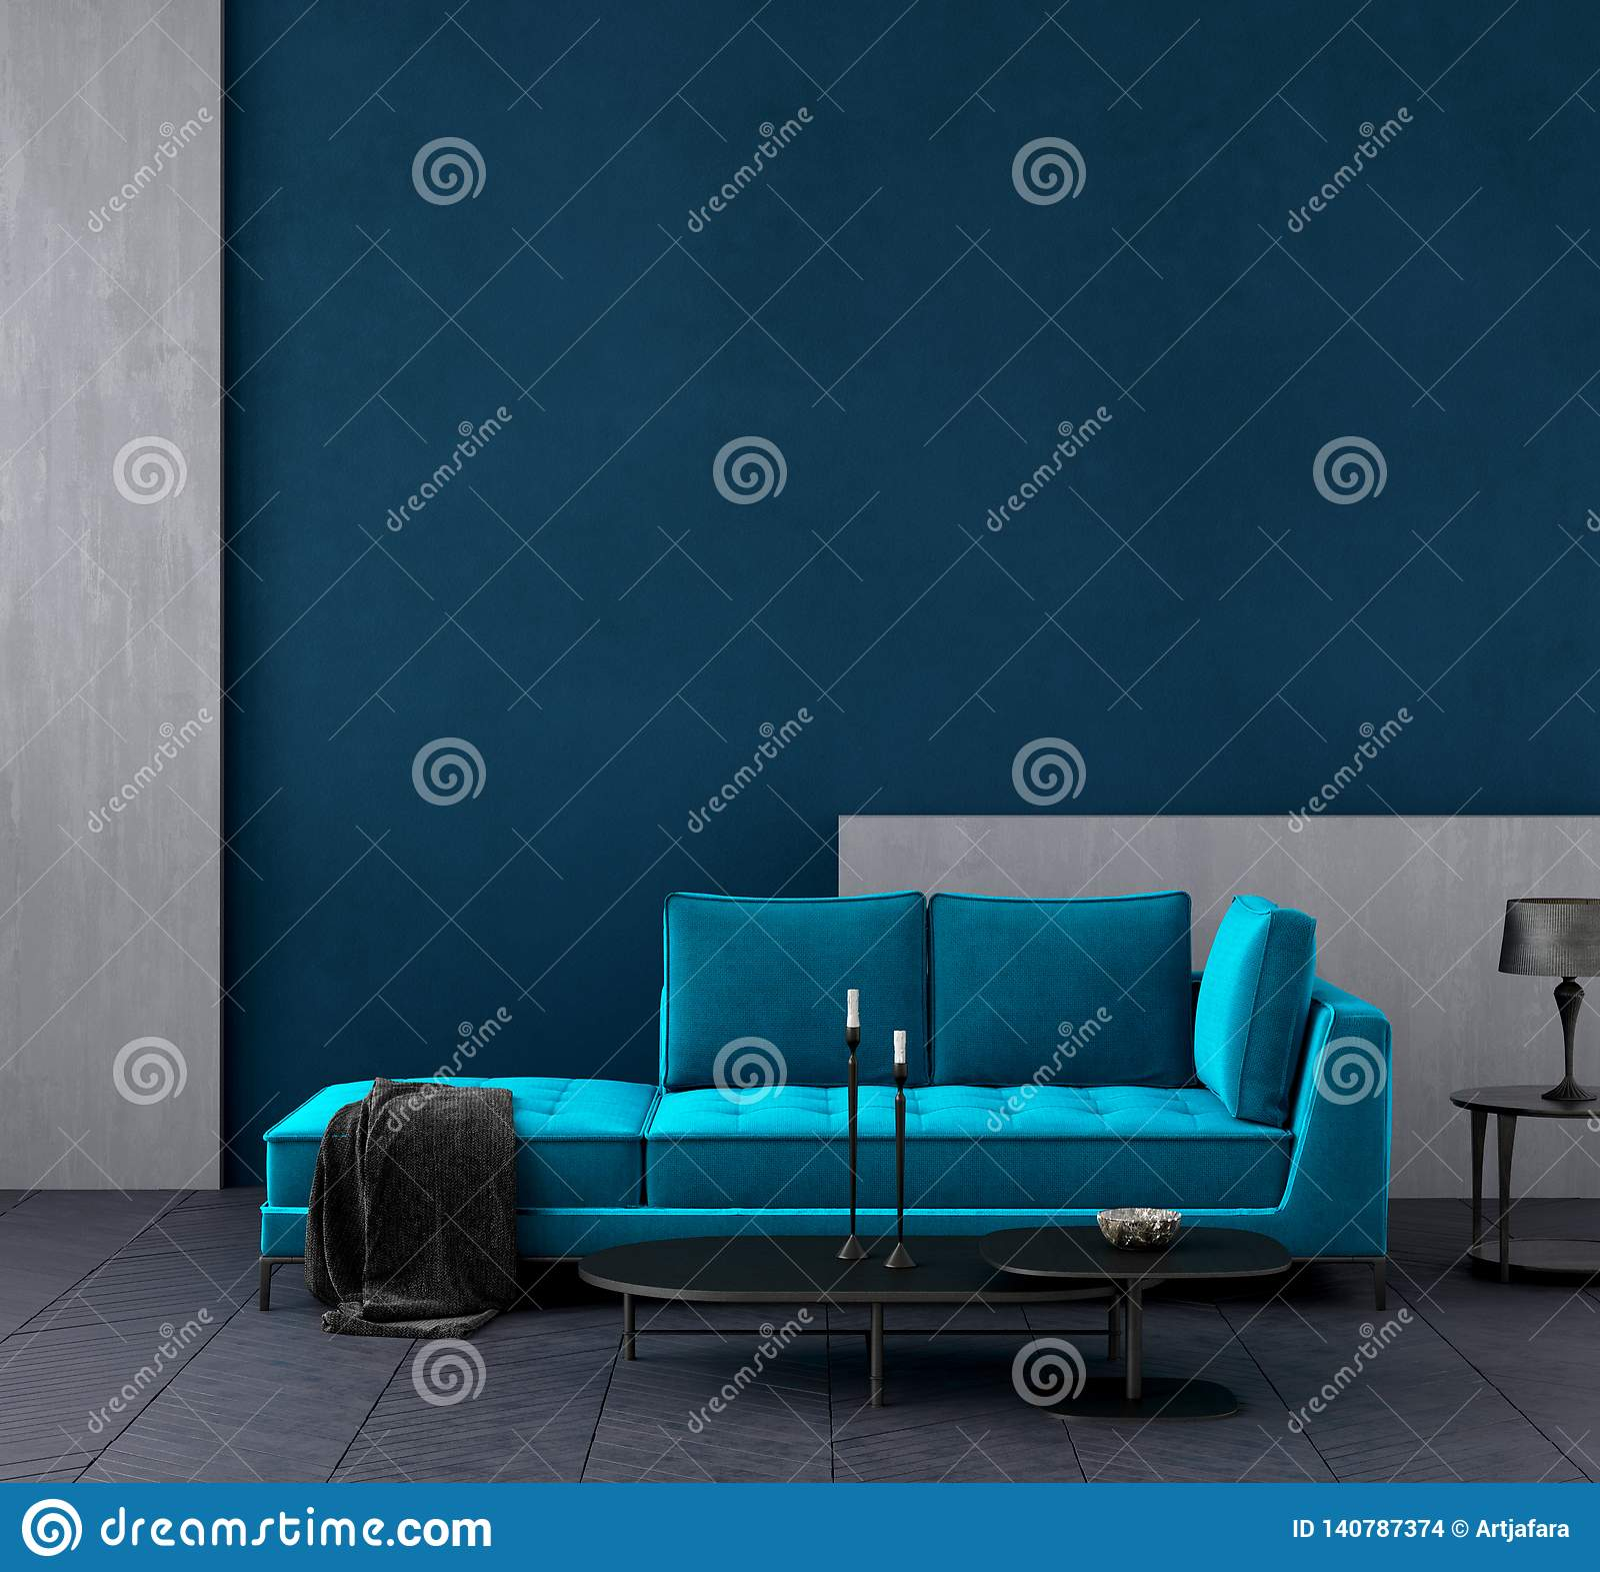 Modern donkerblauw woonkamerbinnenland met azuurblauwe kleuren omhoog laag, muurspot